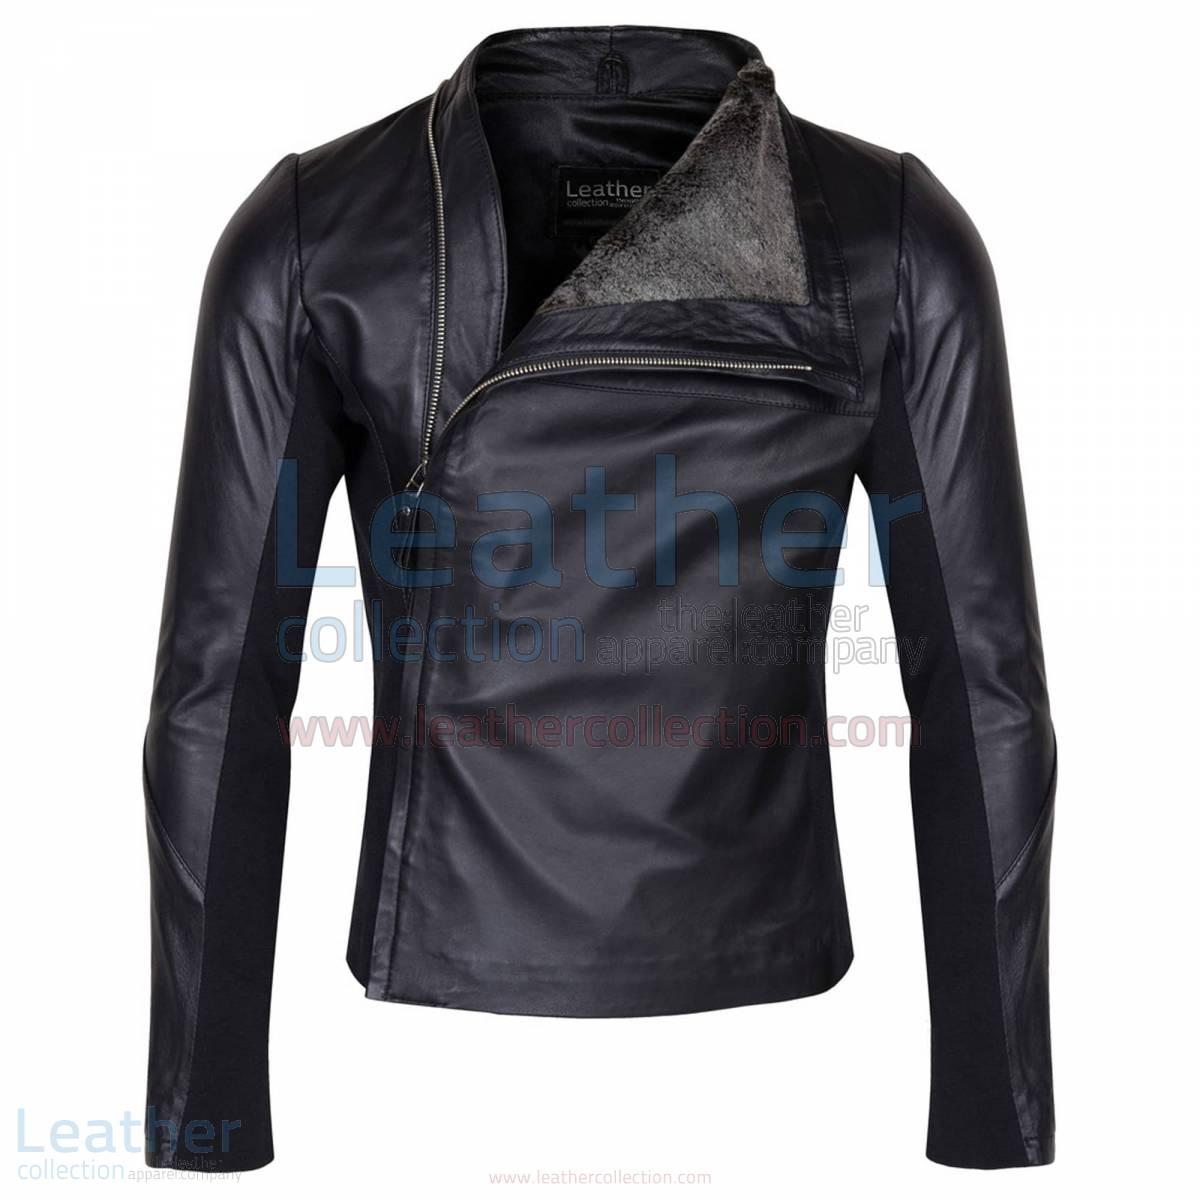 Slim & Smart Leather Jacket with Fur Lining –  Jacket